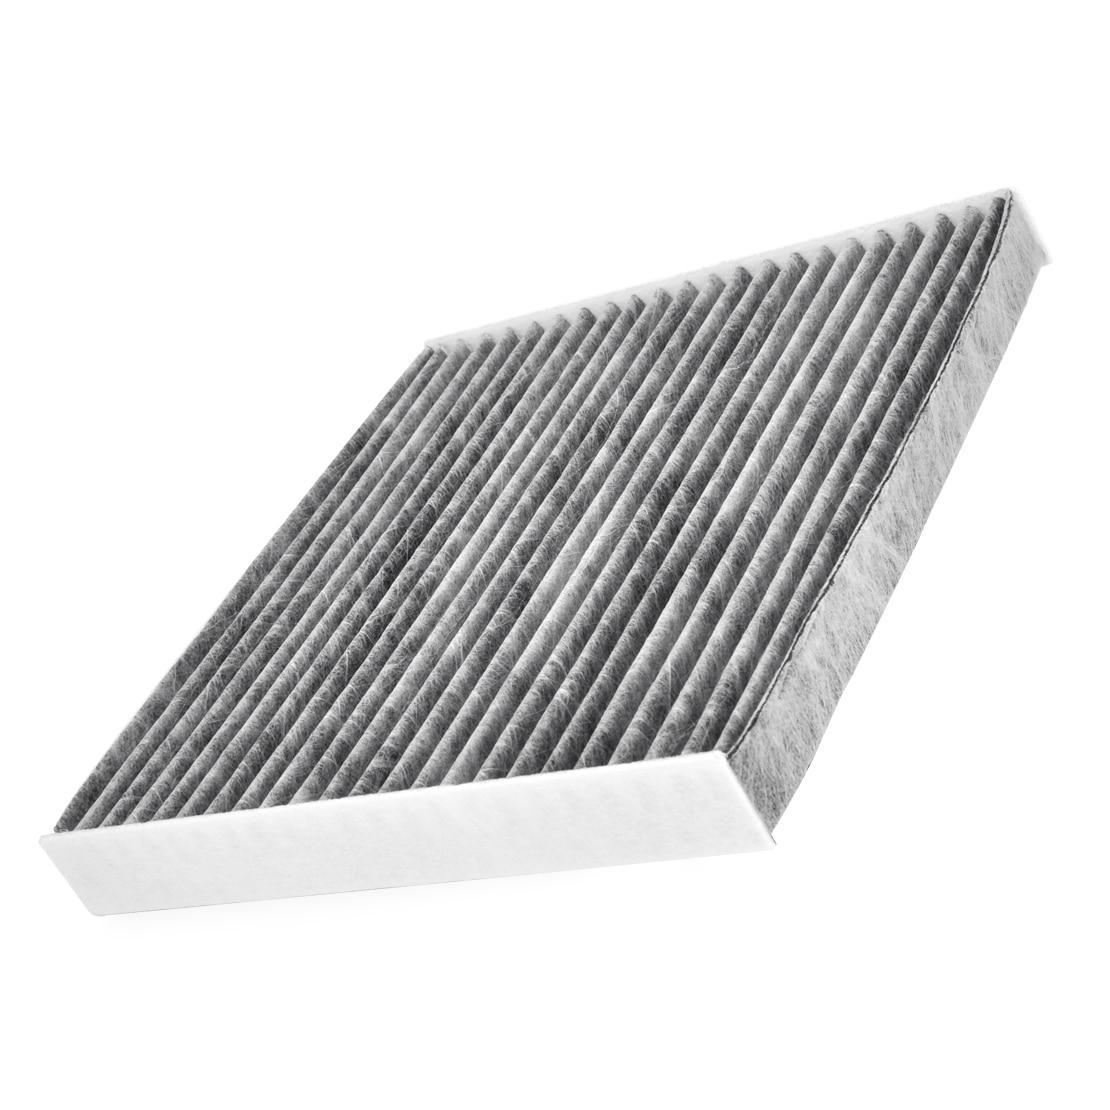 Dwcx 1pc new carbon fiber cabin air filter gj6b 61 p11 gj6a 61